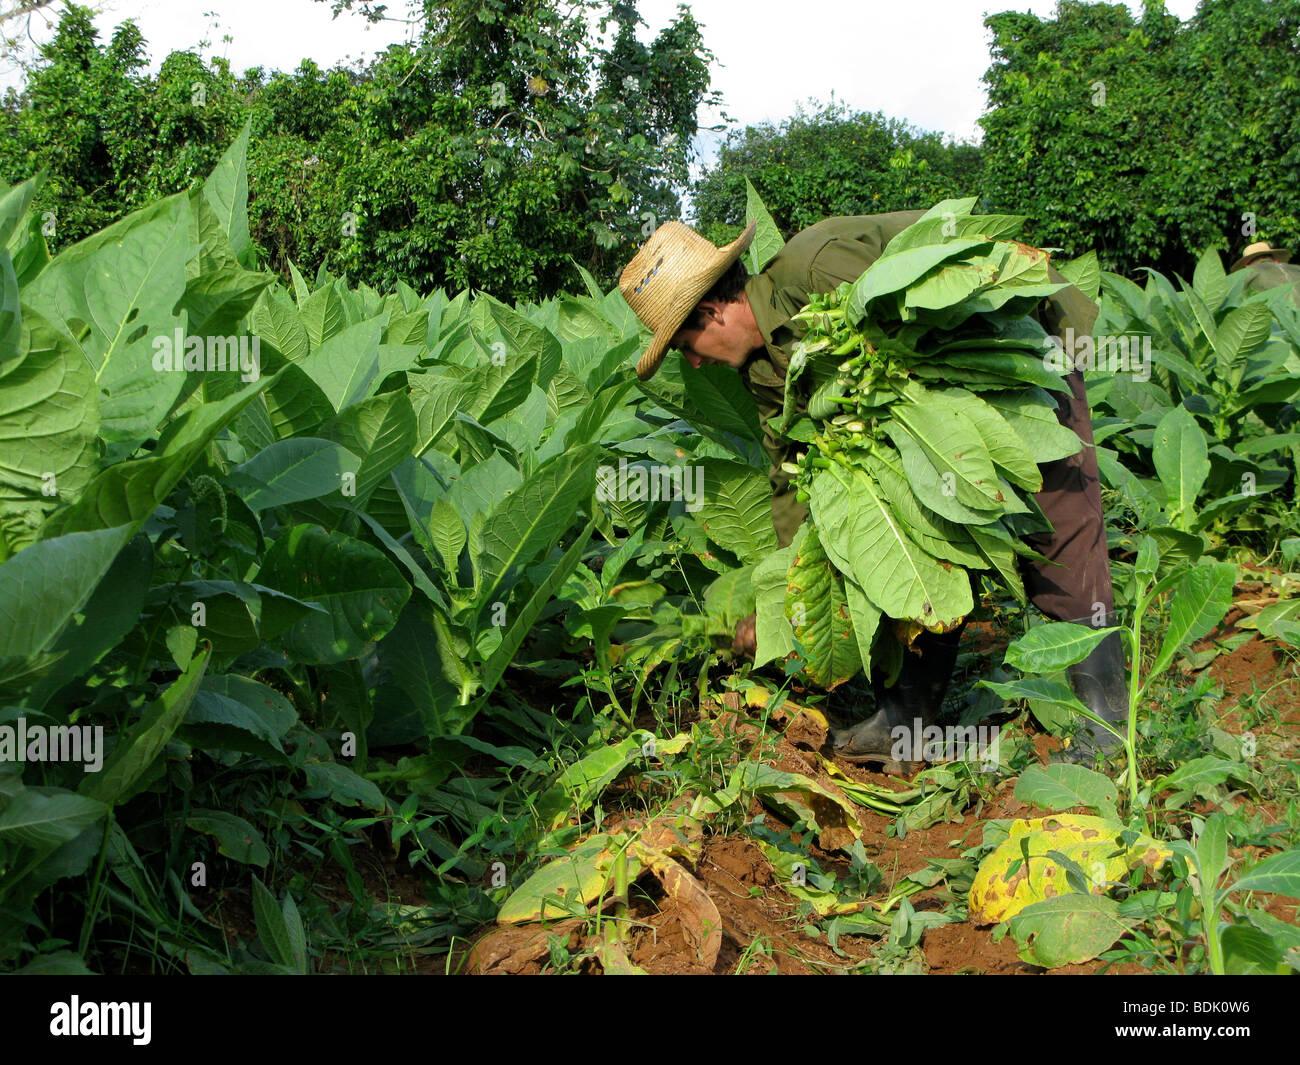 Harvesting tobacco leaves for cigar production at Pinar del Rio. Cuba. - Stock Image